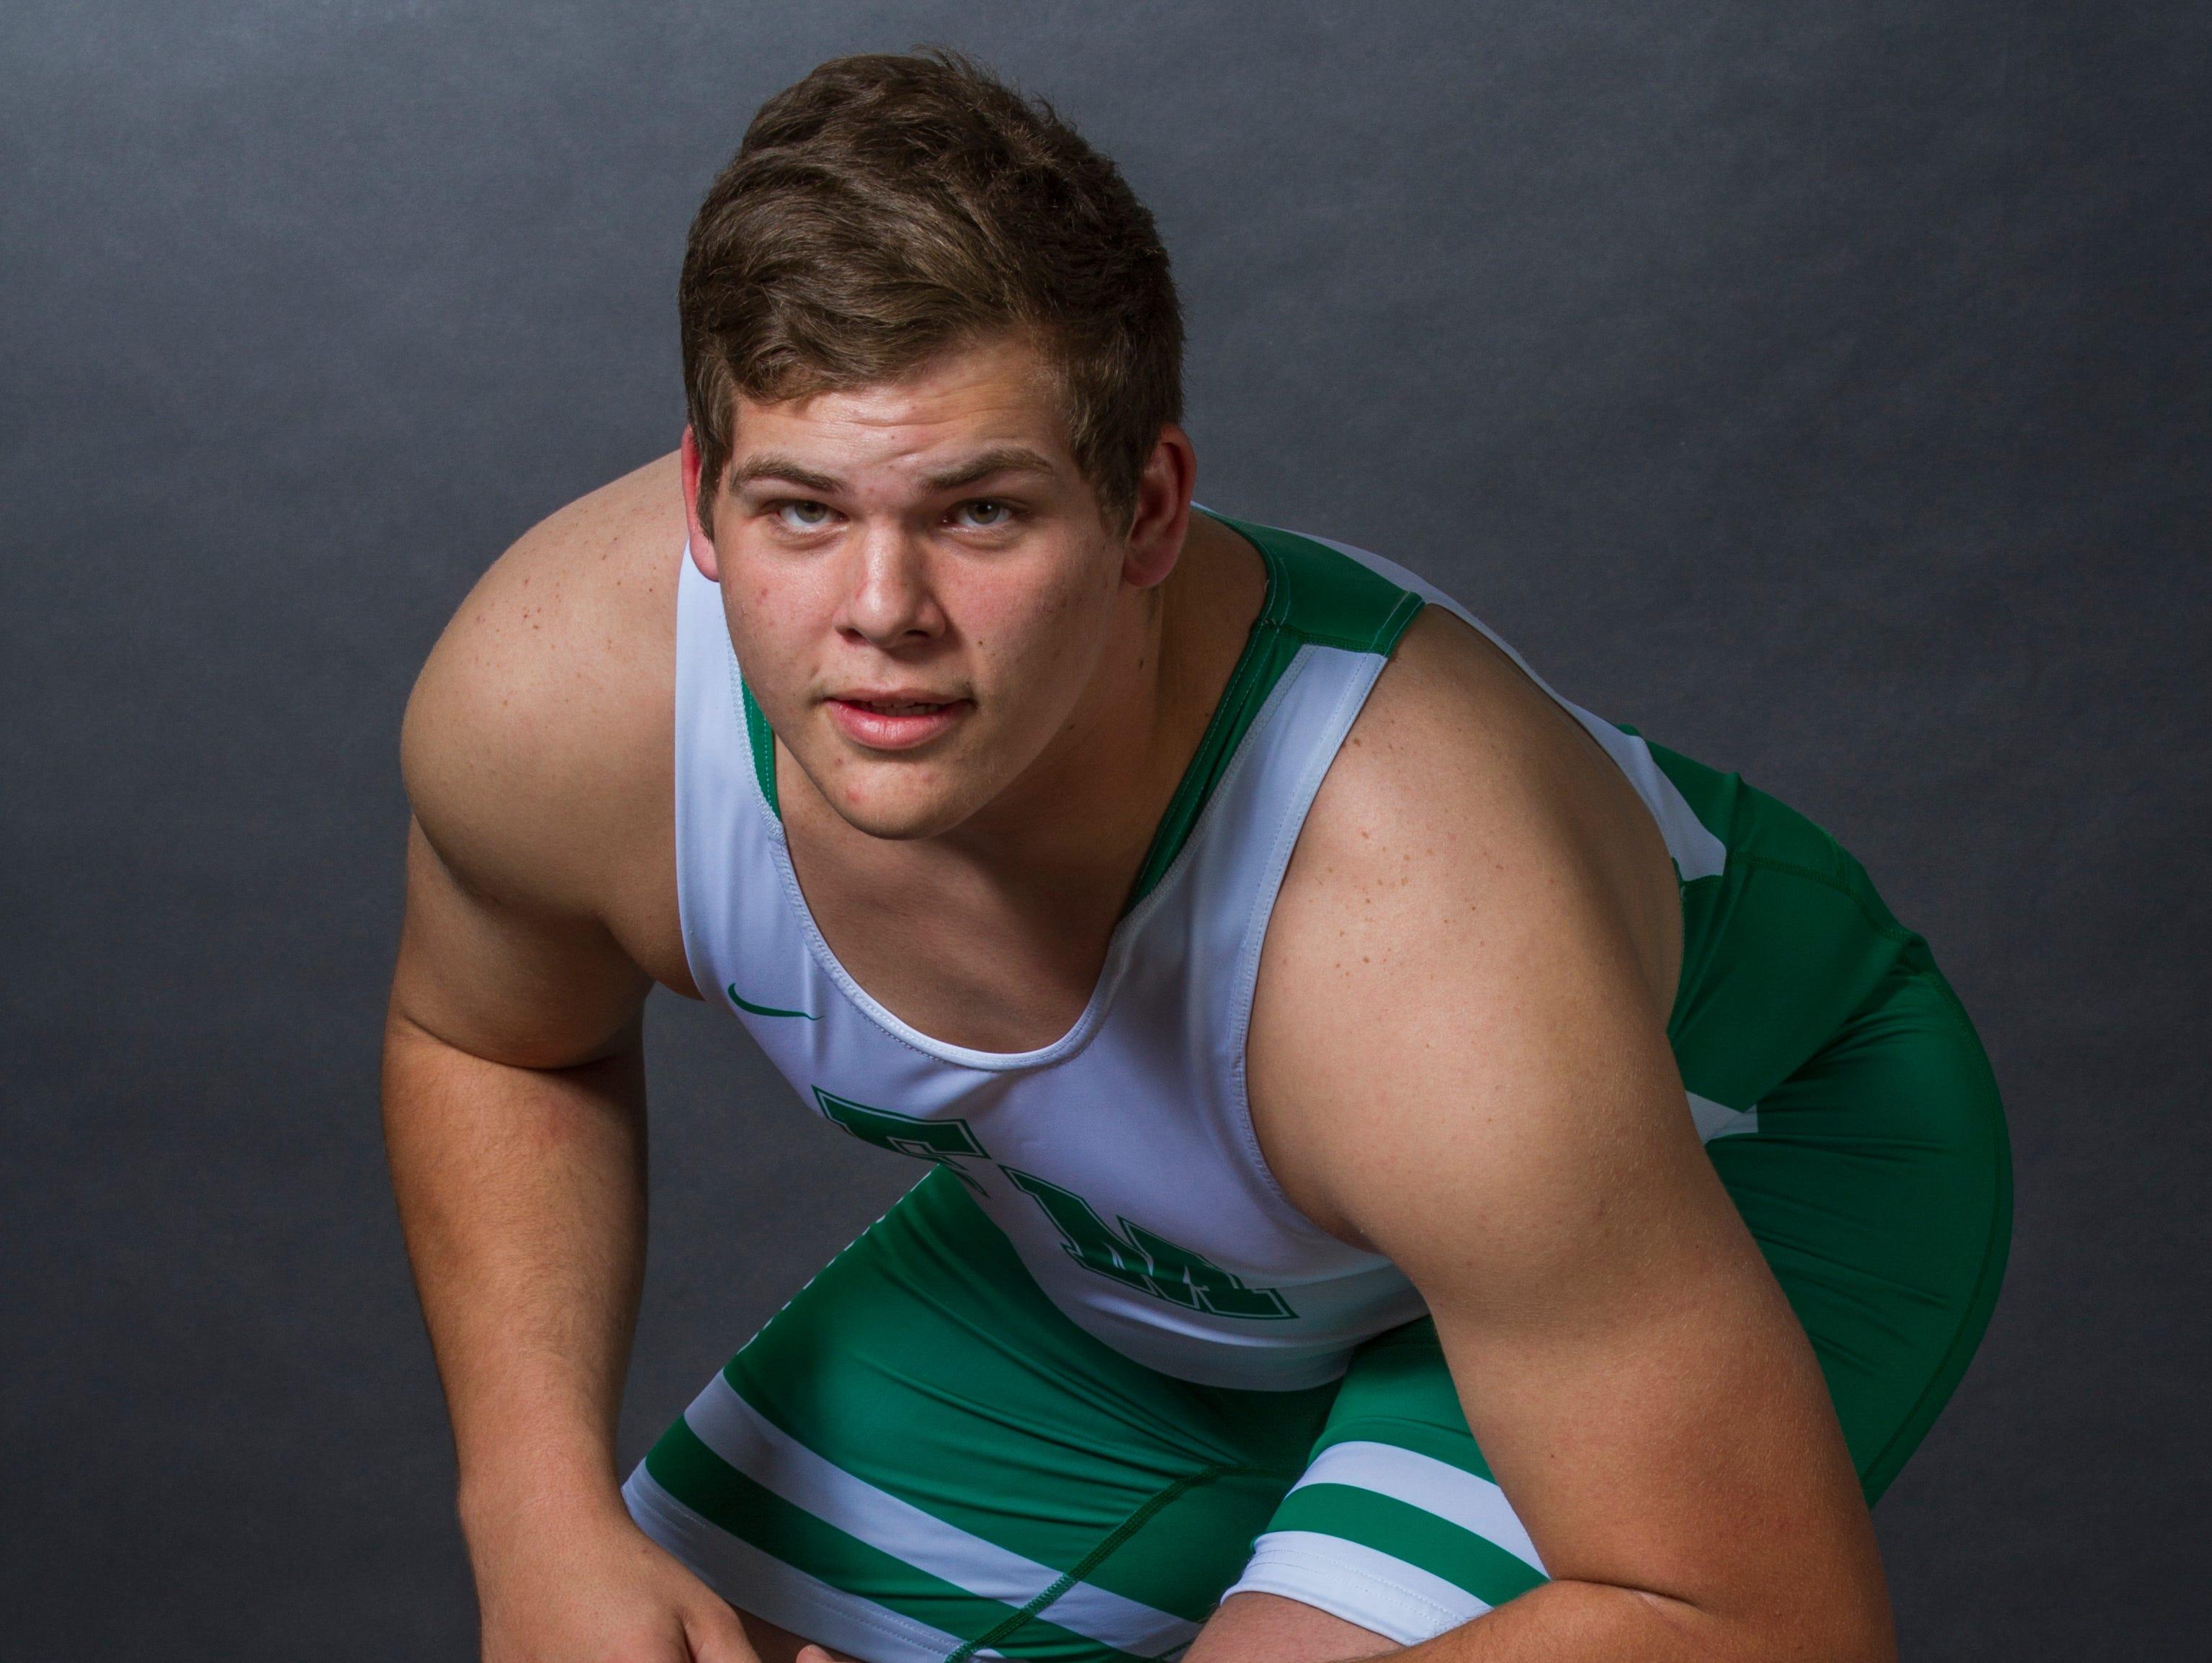 Mike Delago, 18, is a senior wrestler at Fort Myers High School.